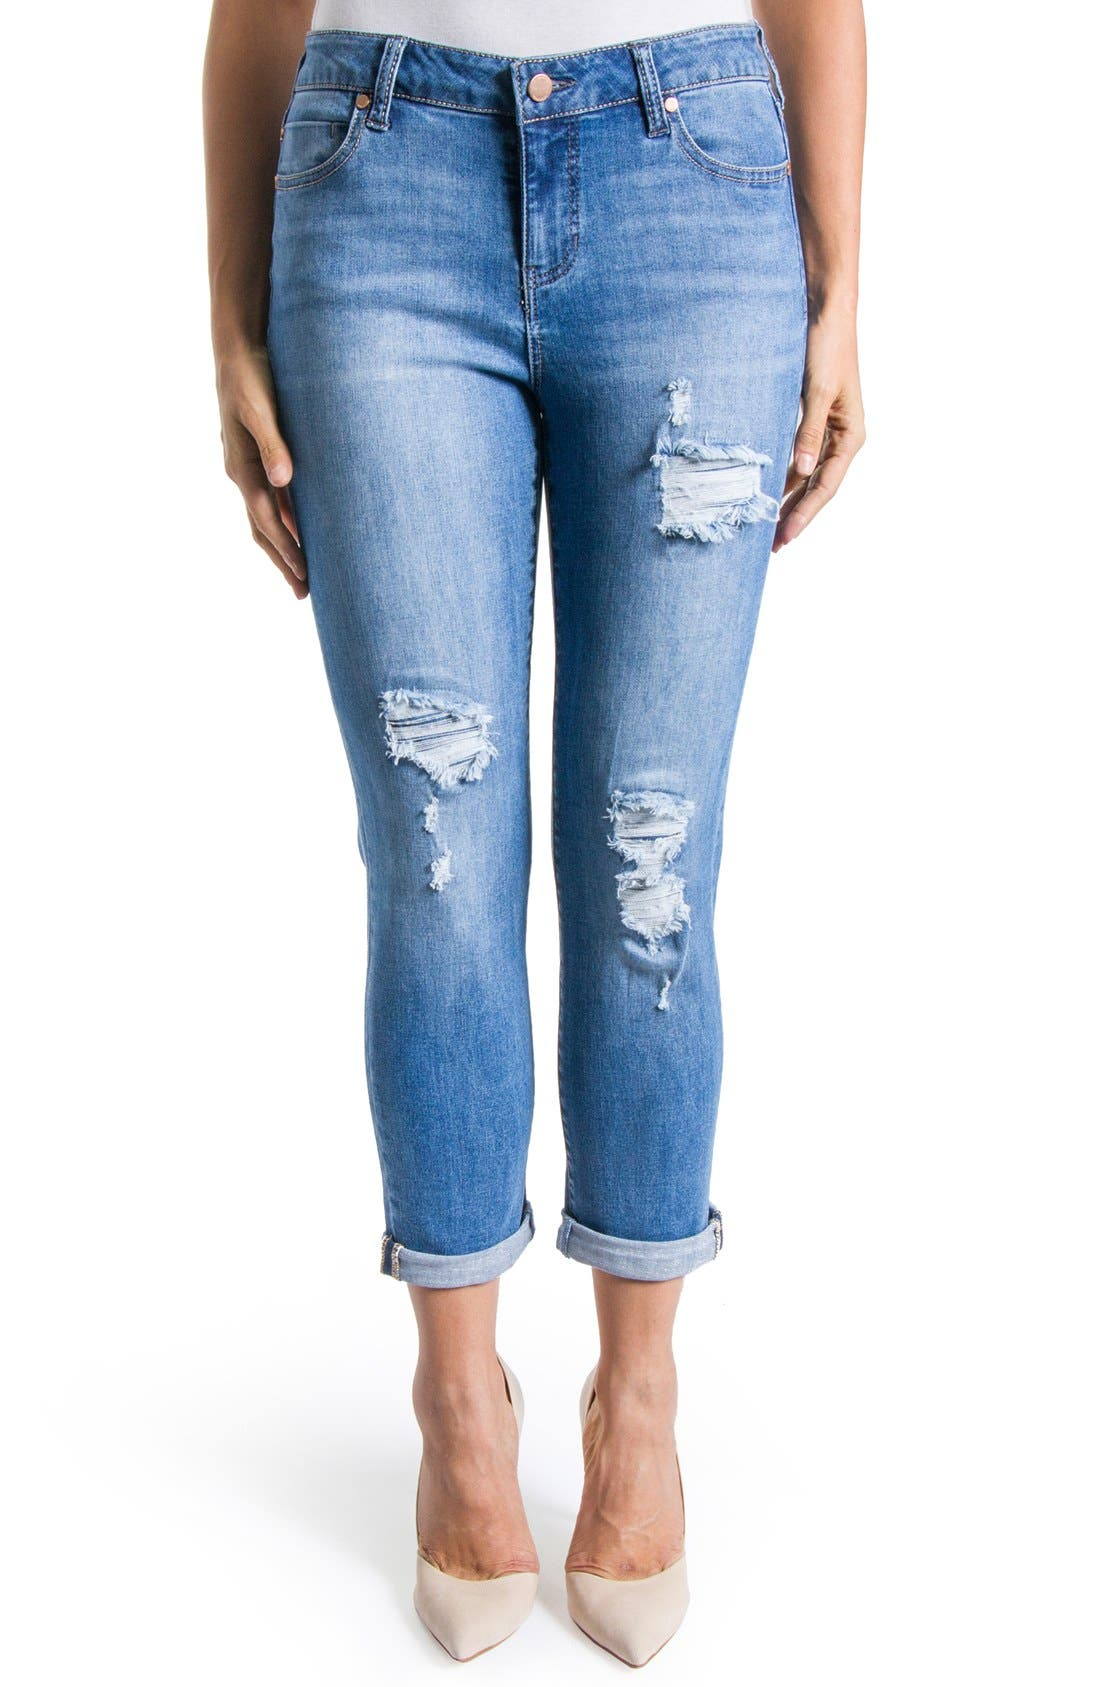 Main Image - Liverpool Jeans Company 'Corey' Distressed Crop Boyfriend Jeans (Melbourne)